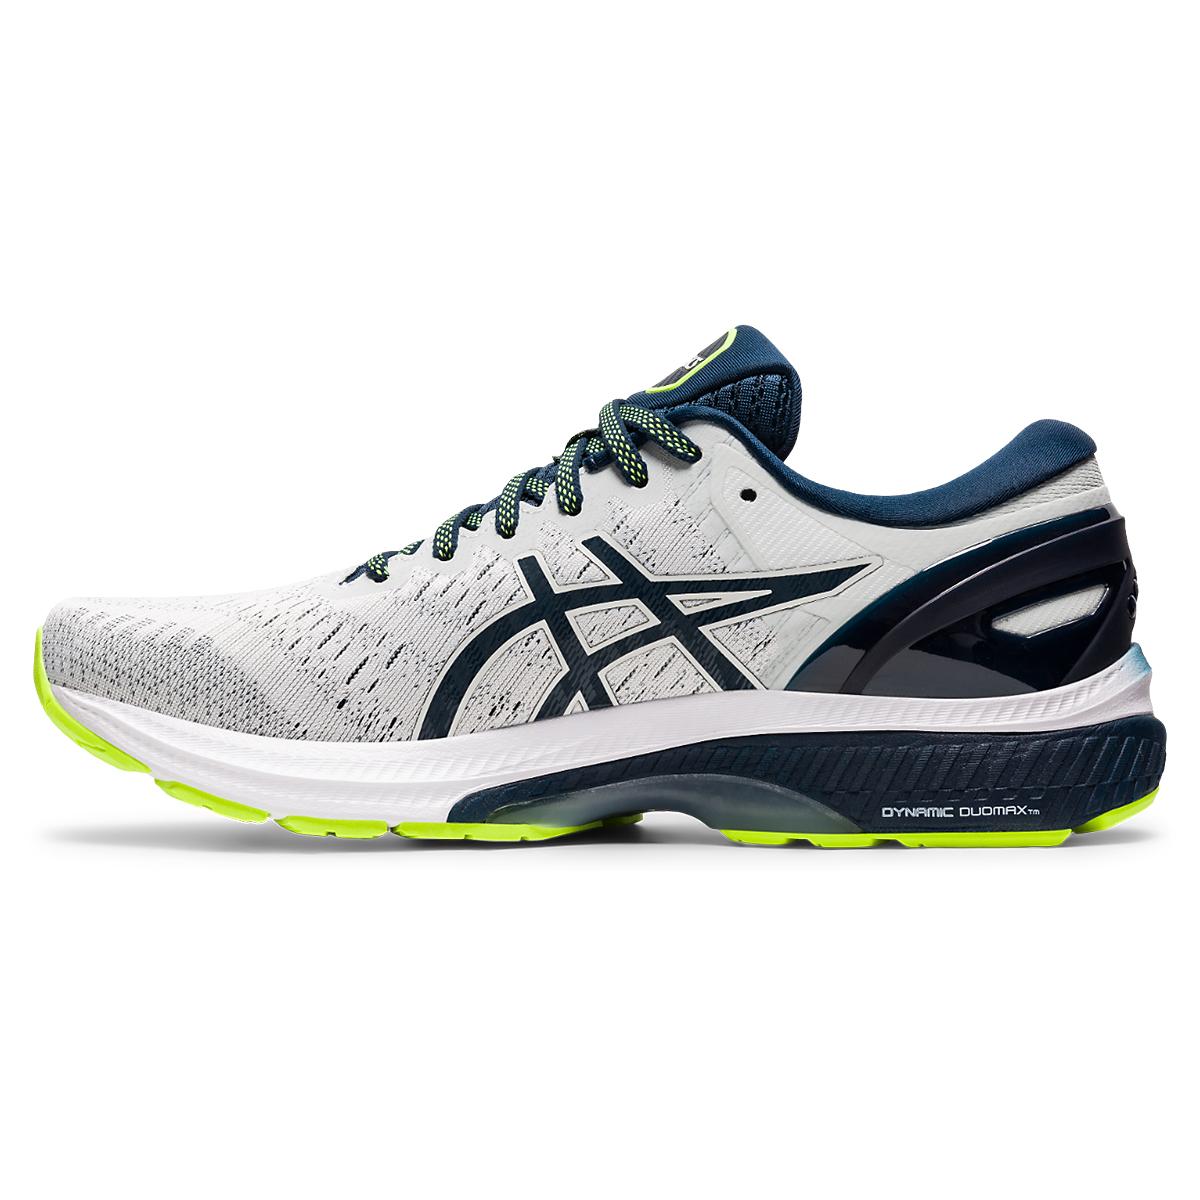 Men's Asics Gel-Kayano 27 Running Shoe - Color: Grey/Green/Blue - Size: 7 - Width: Regular, Grey/Green/Blue, large, image 2